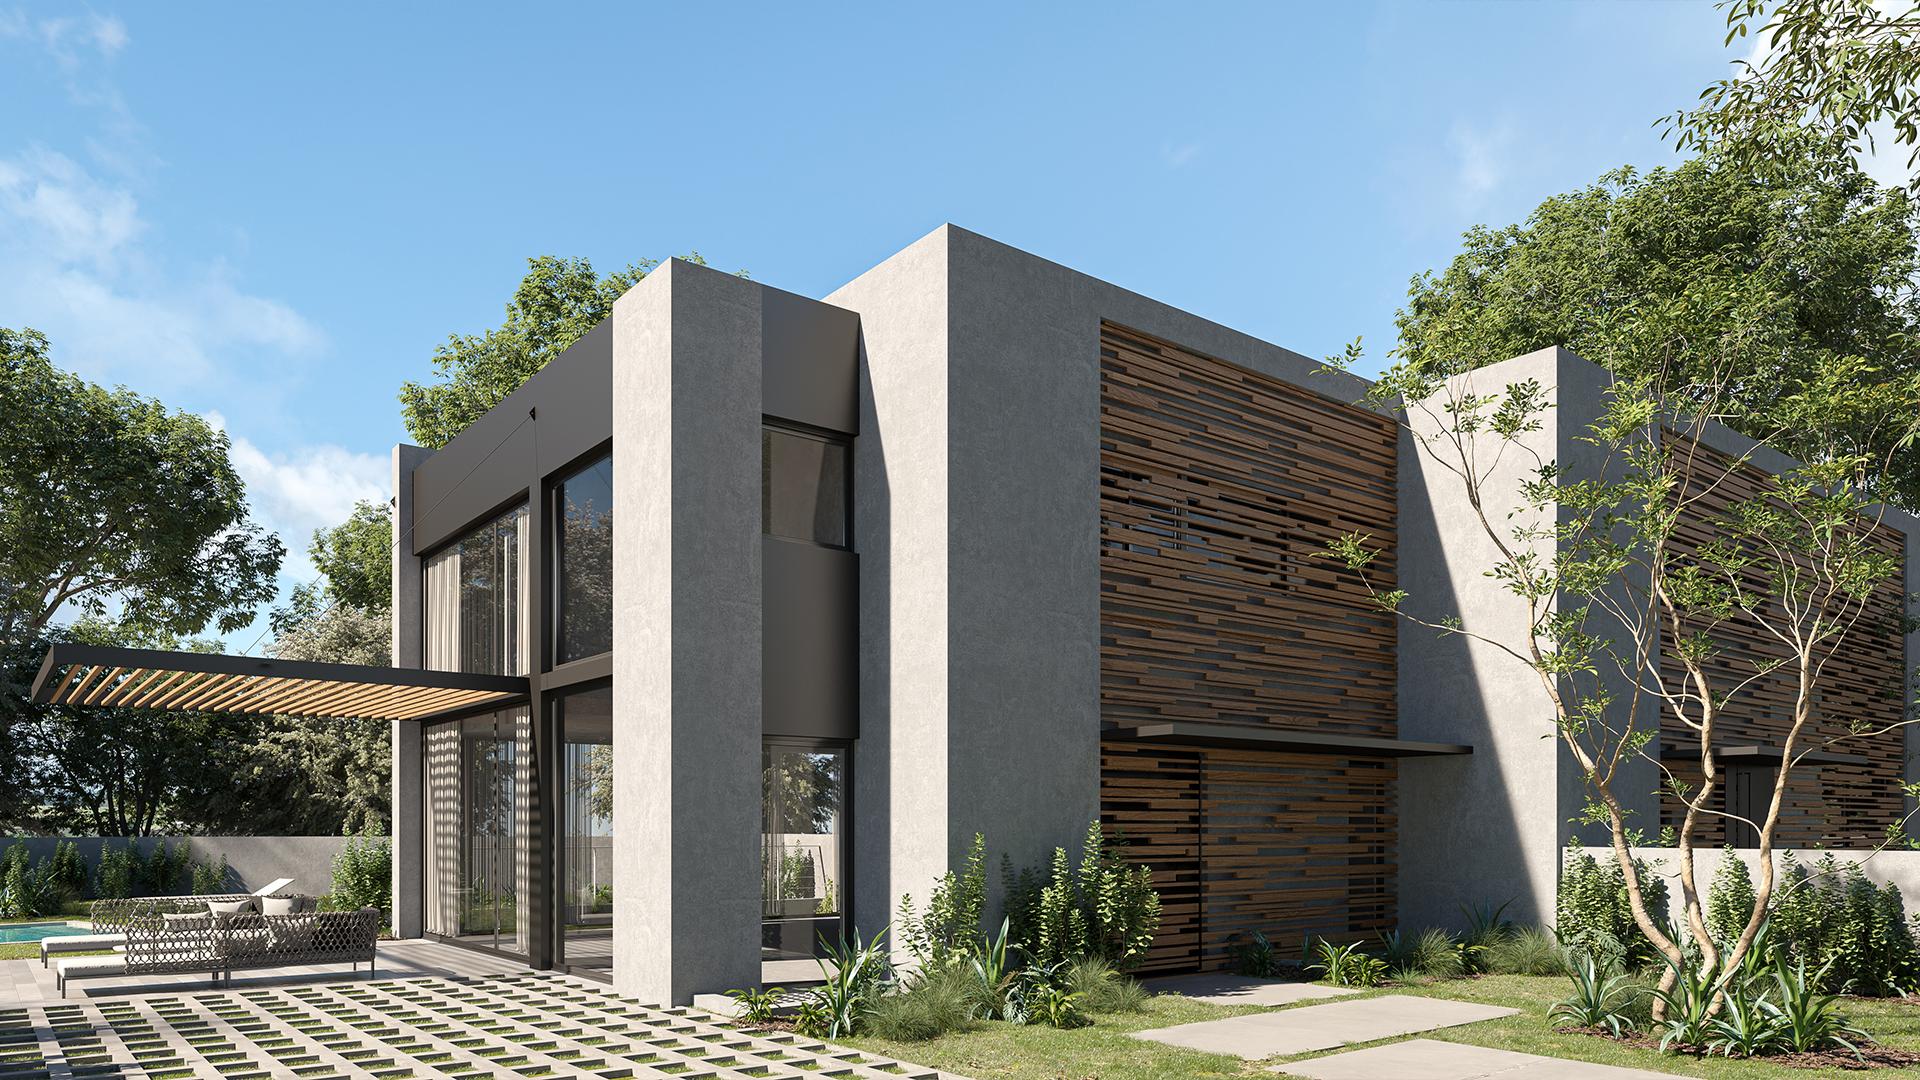 Maayan-Golan_Architectural-Visualization_exterior-visualization_front-elevation_tel-aviv_architecture-sade-dagan_04